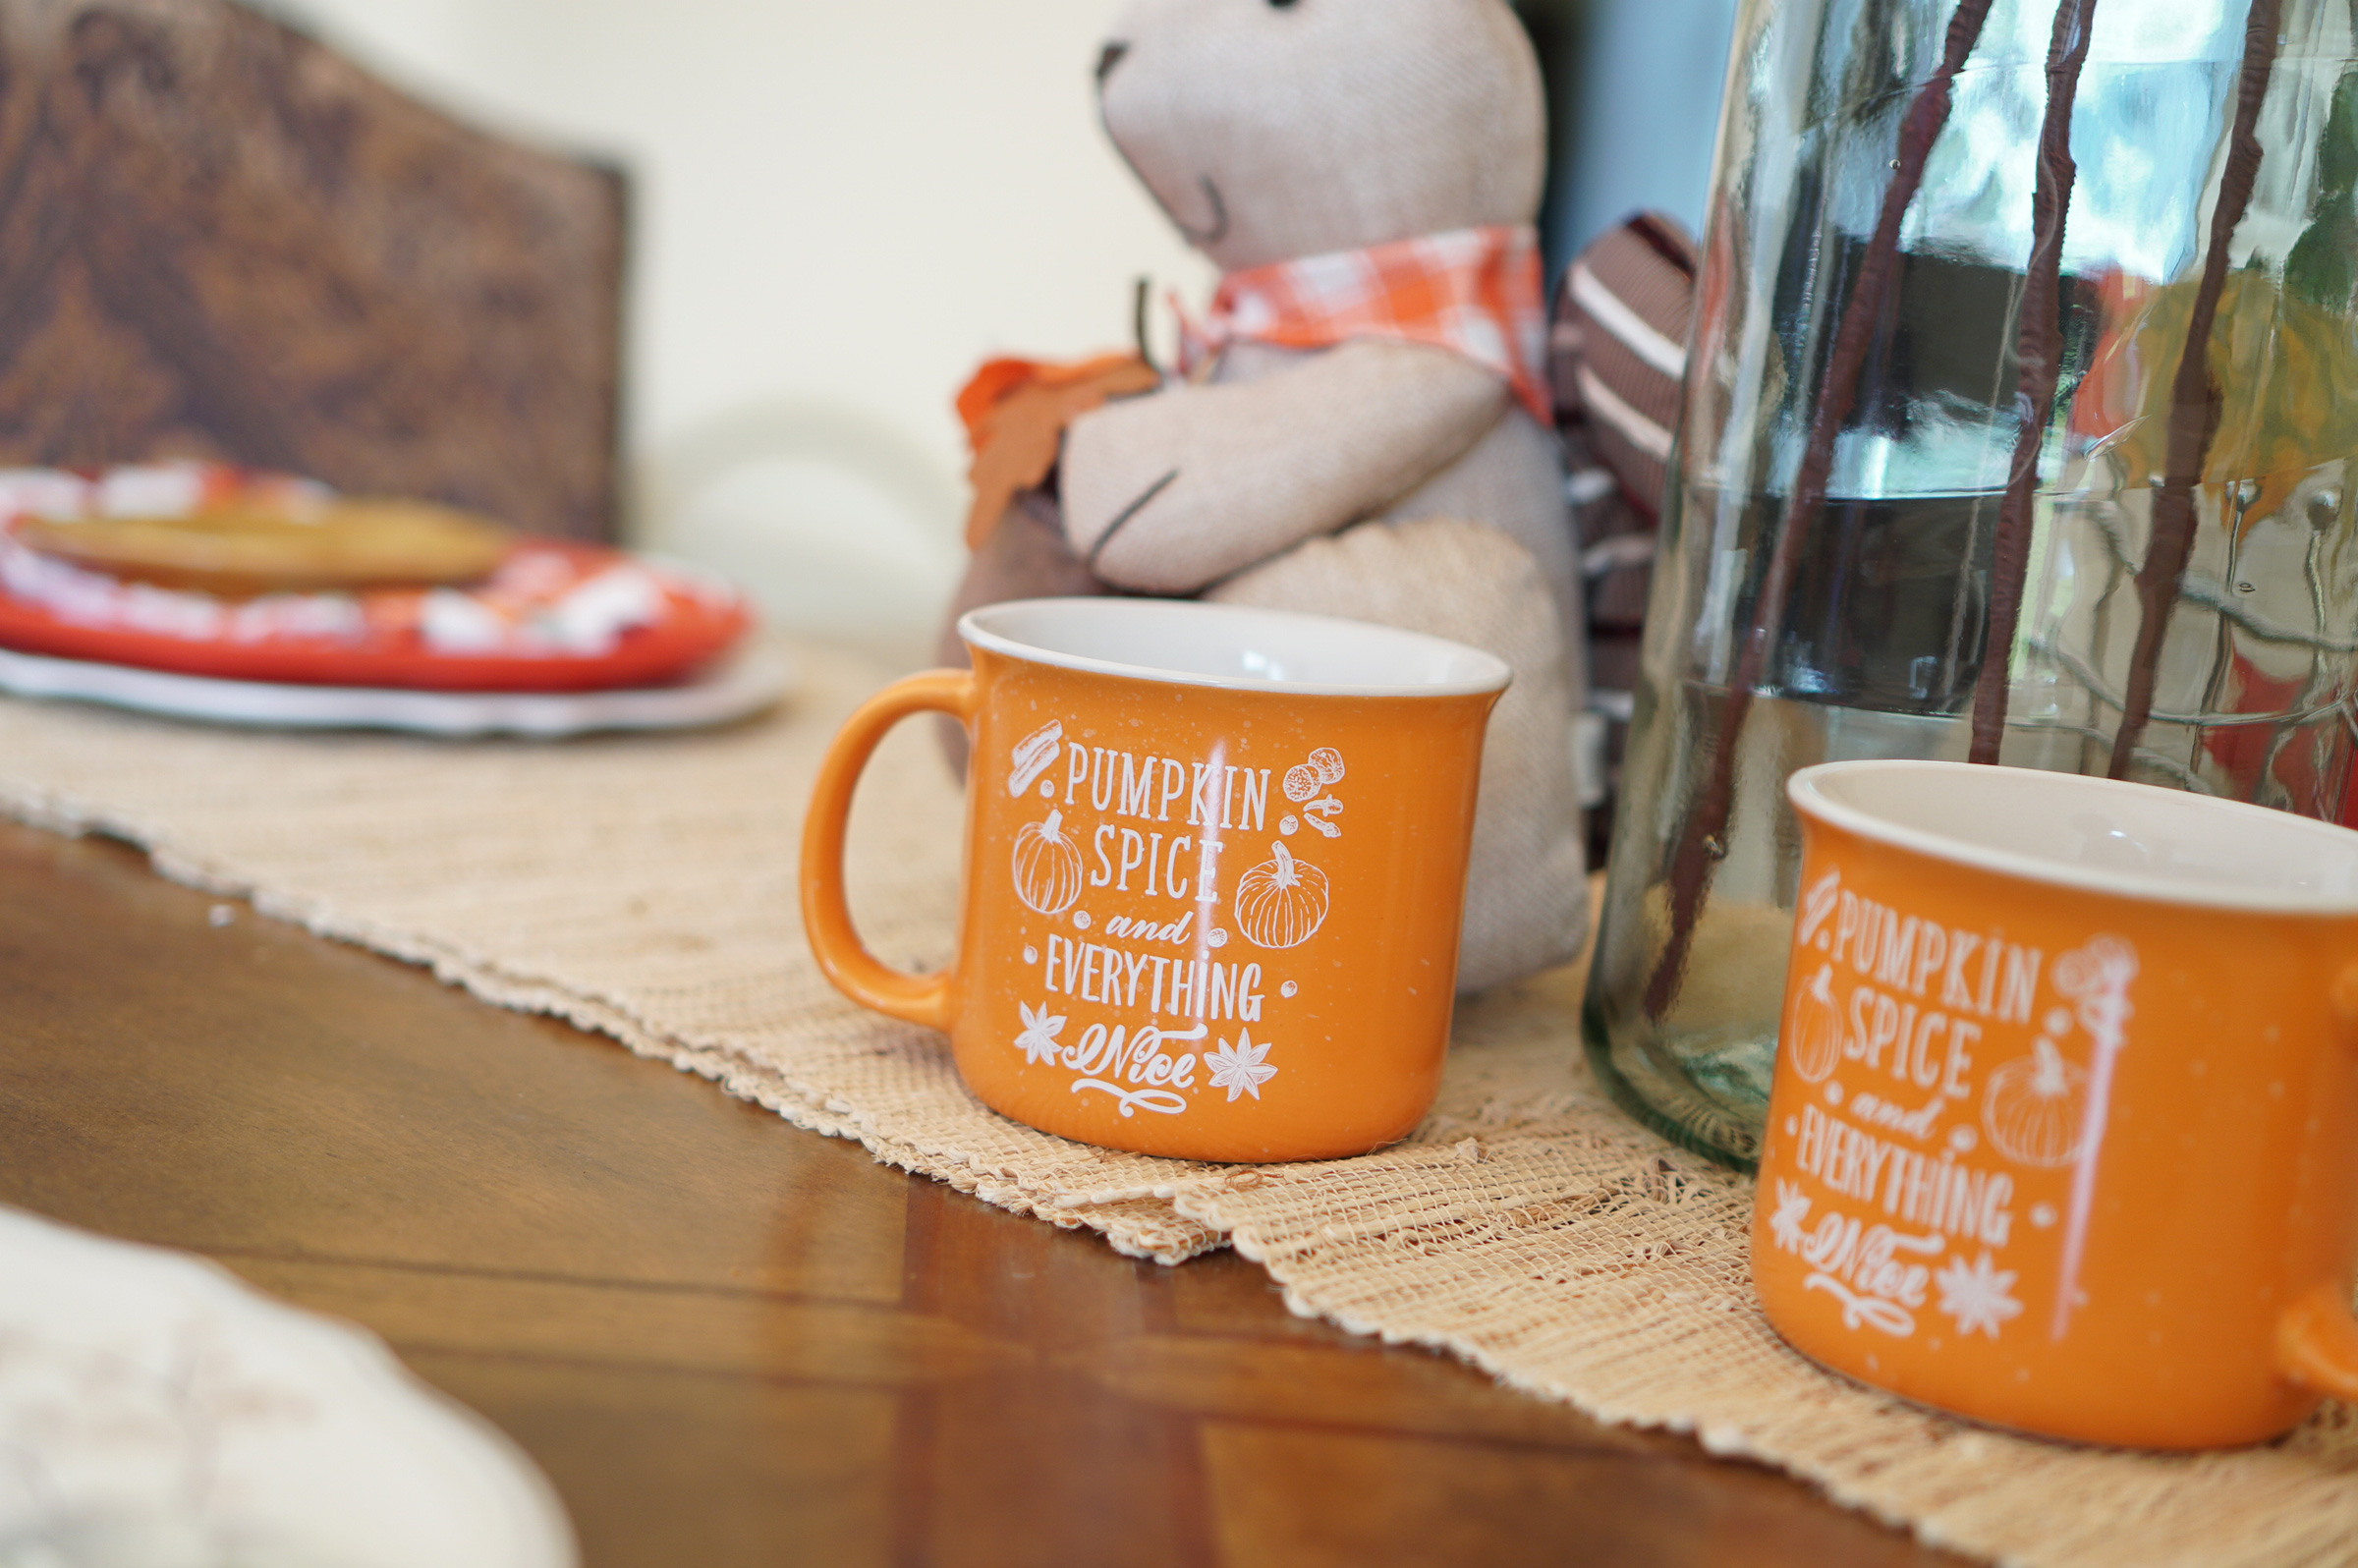 Pumpkin Spice Campers Mug